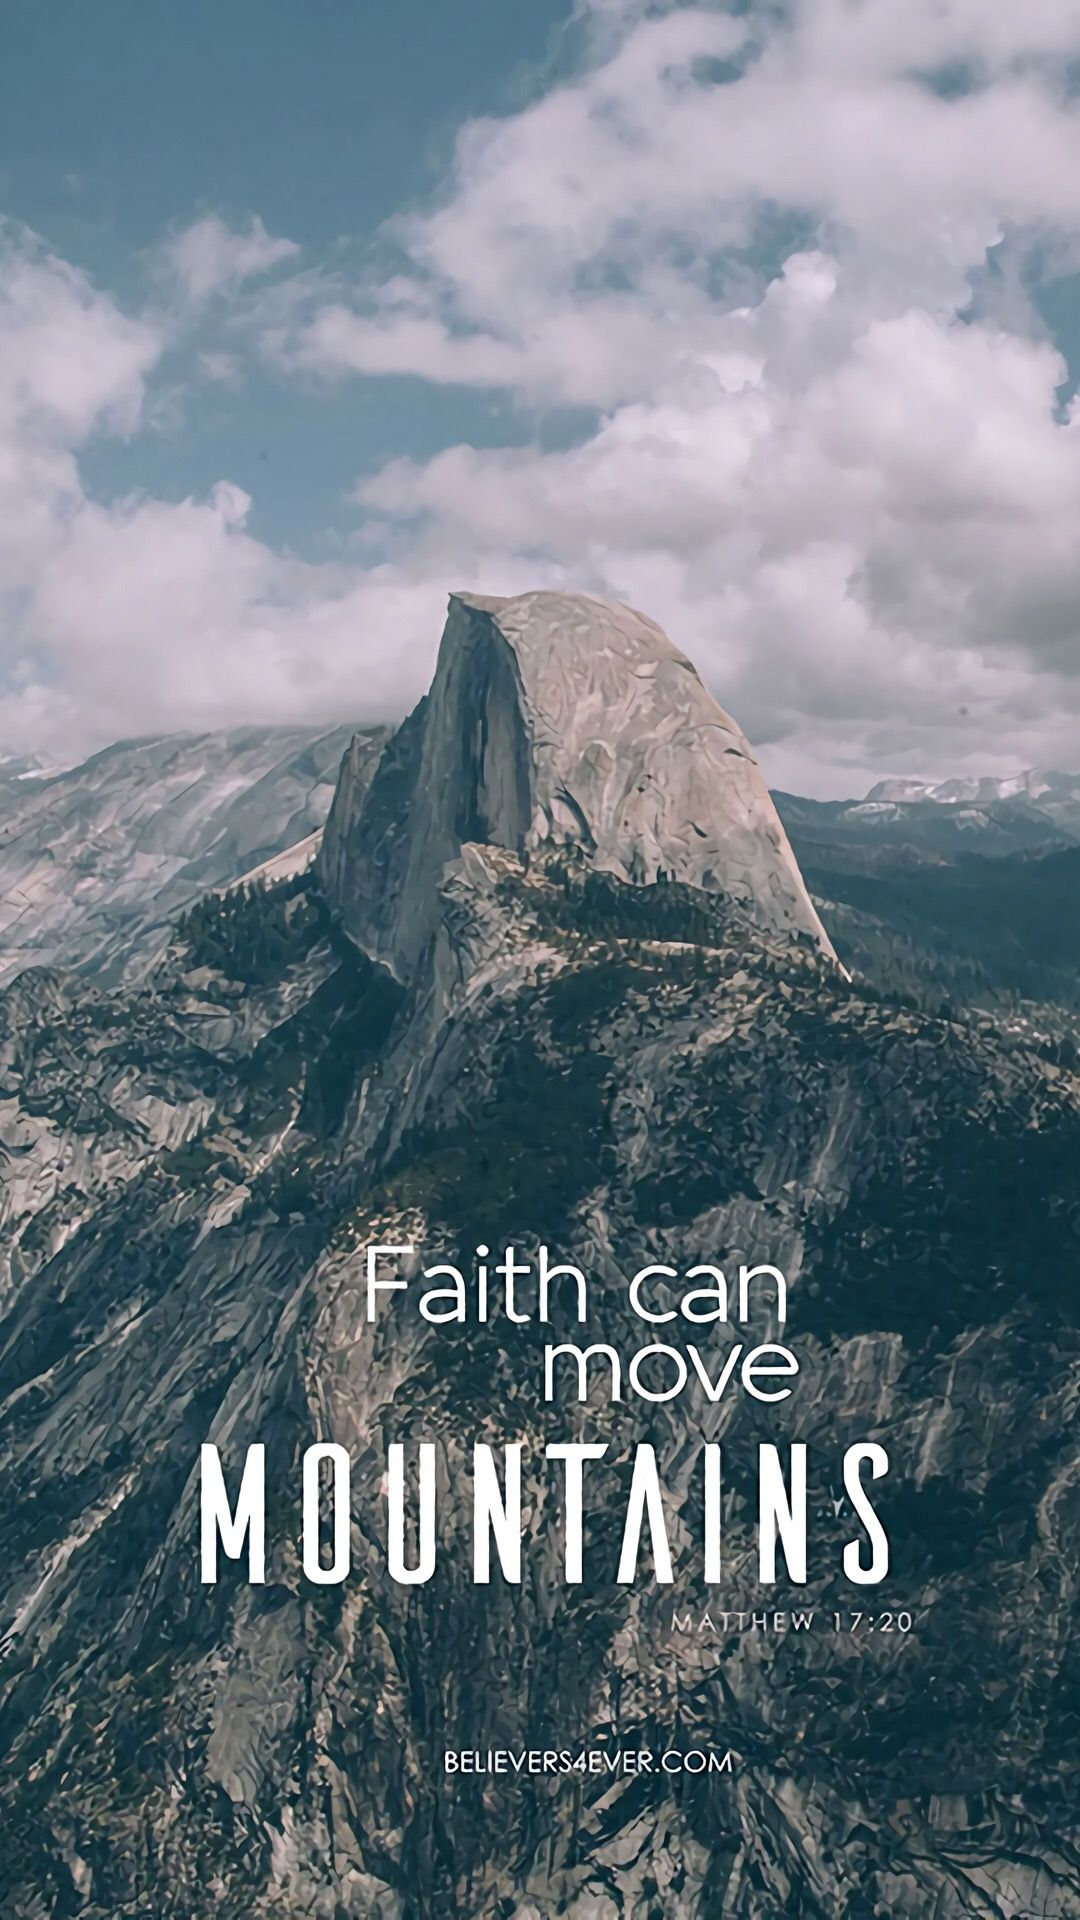 Faith can move mountains which doubt creates. #MoveMountains #FaithCanMoveMountains | GOD IS ...